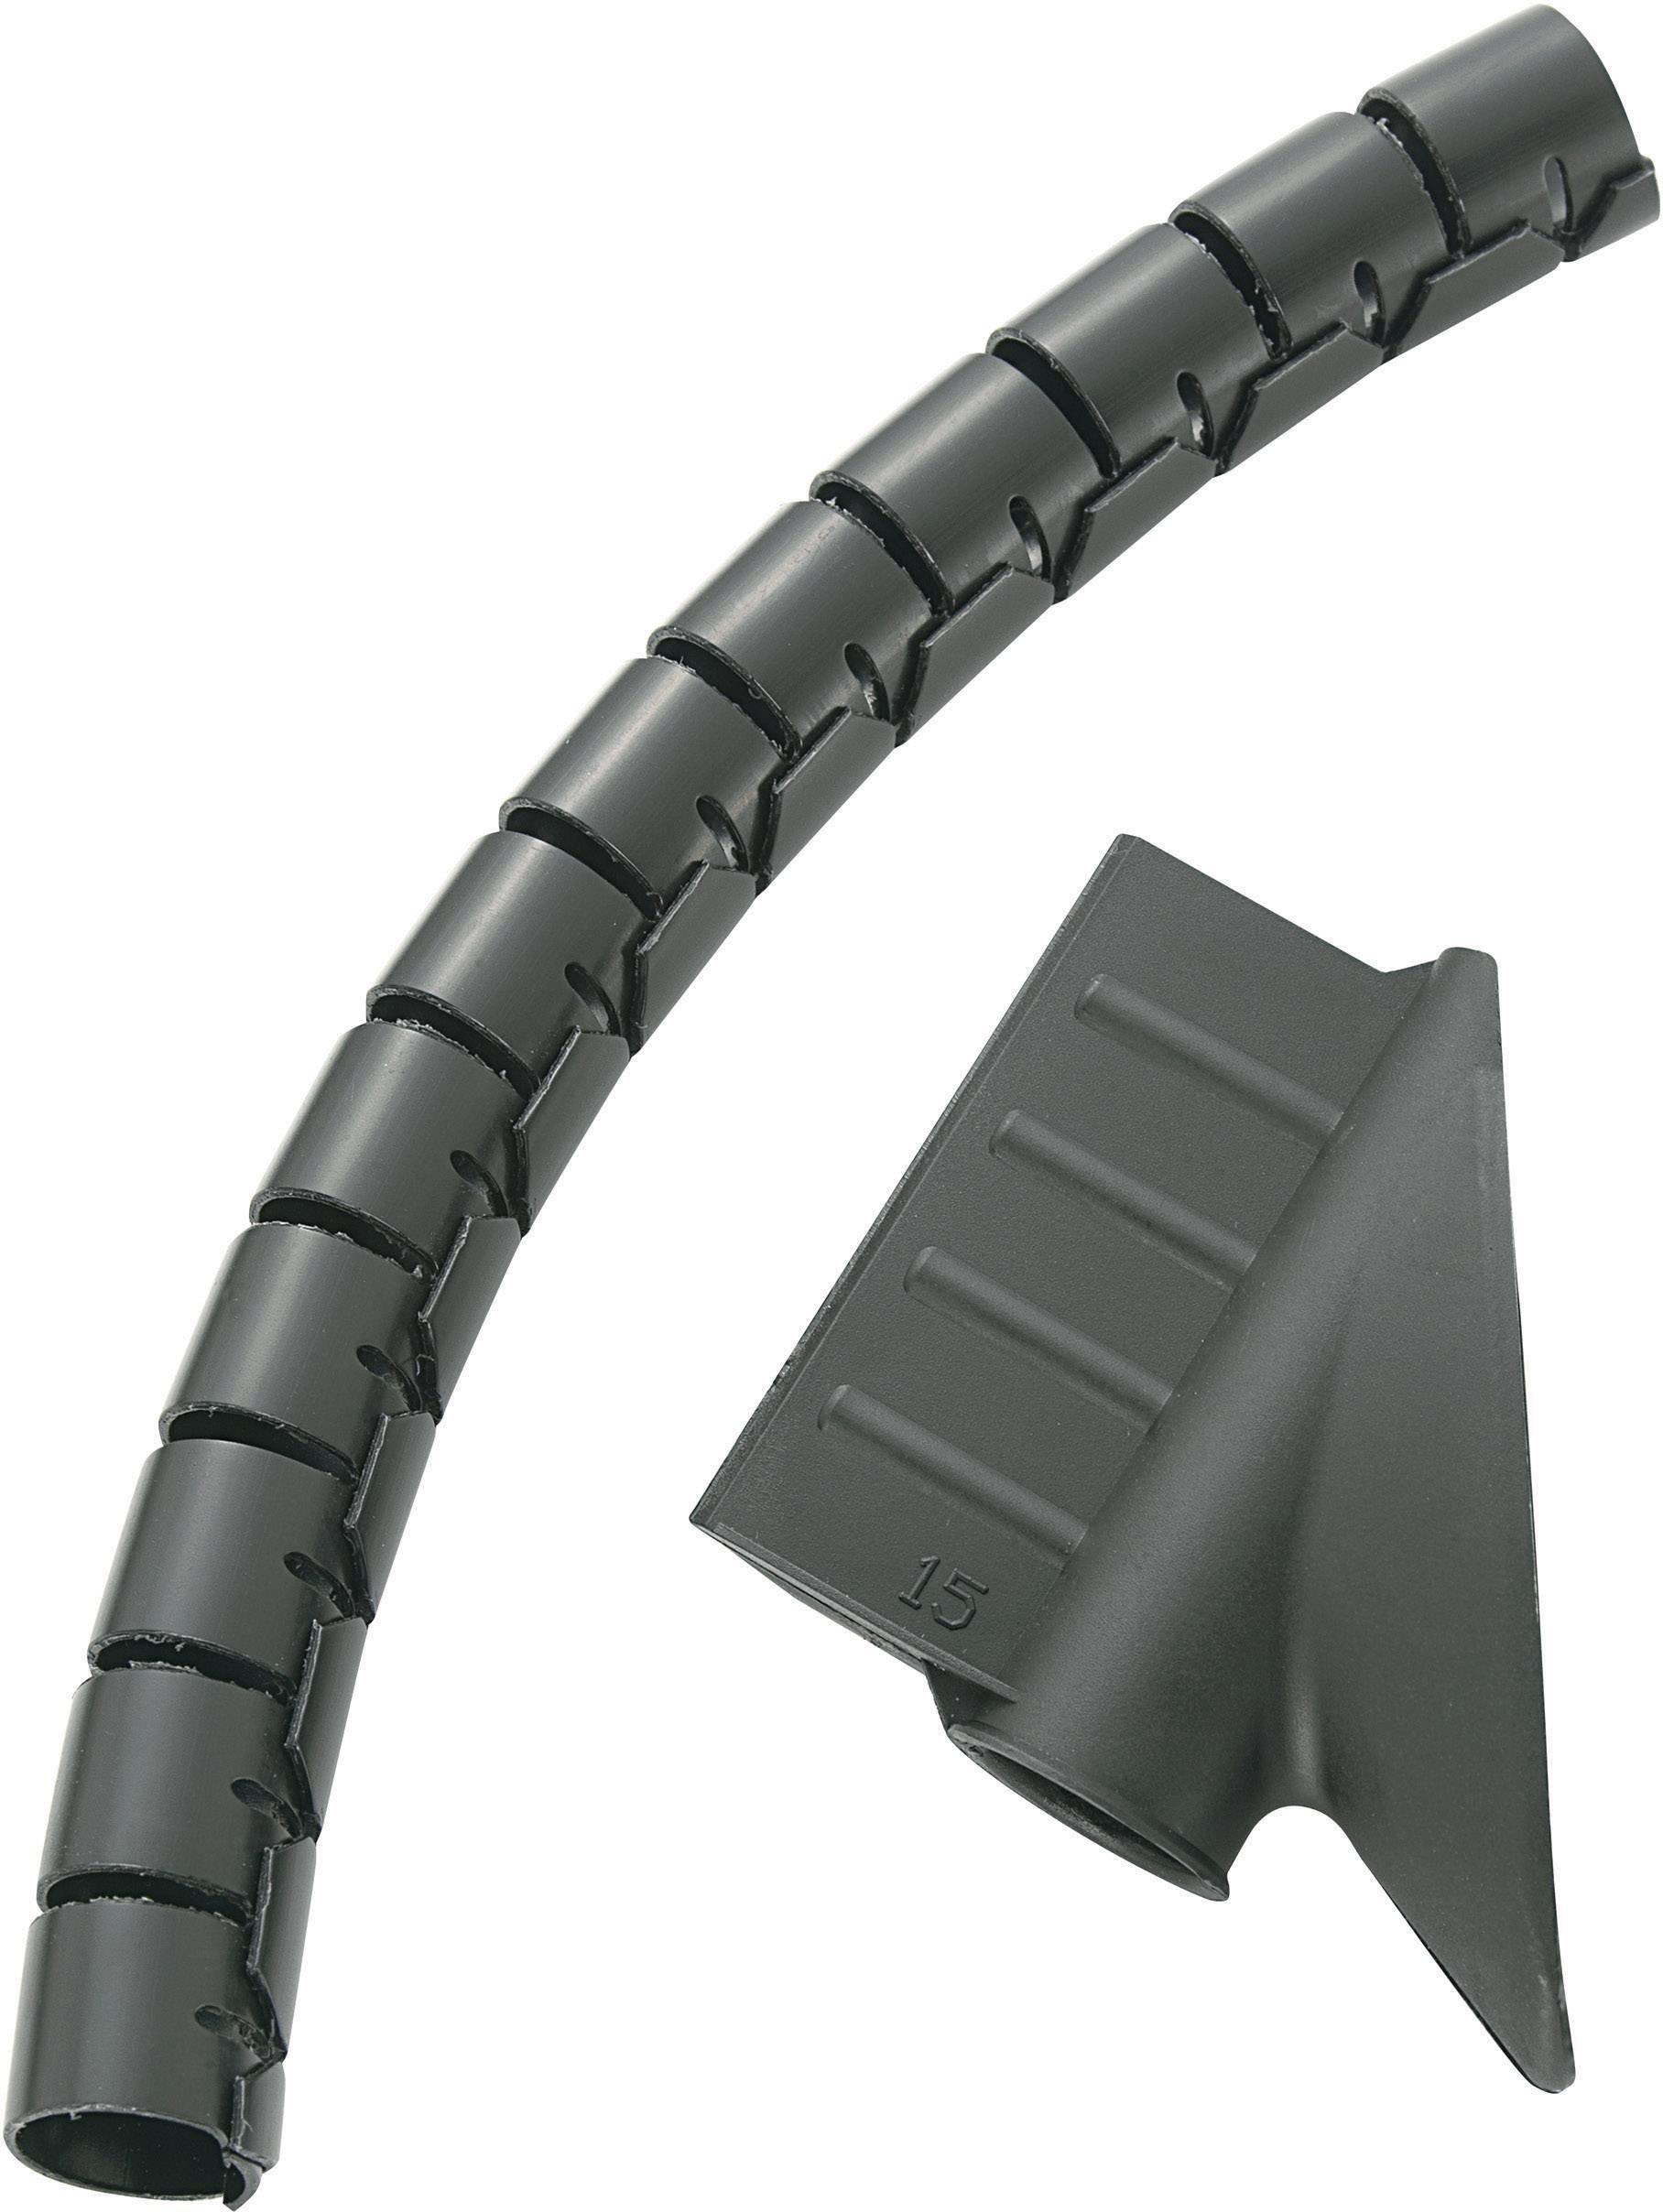 Káblový oplet KSS MX-KLT25SL 28530c1034, strieborná, 5 m